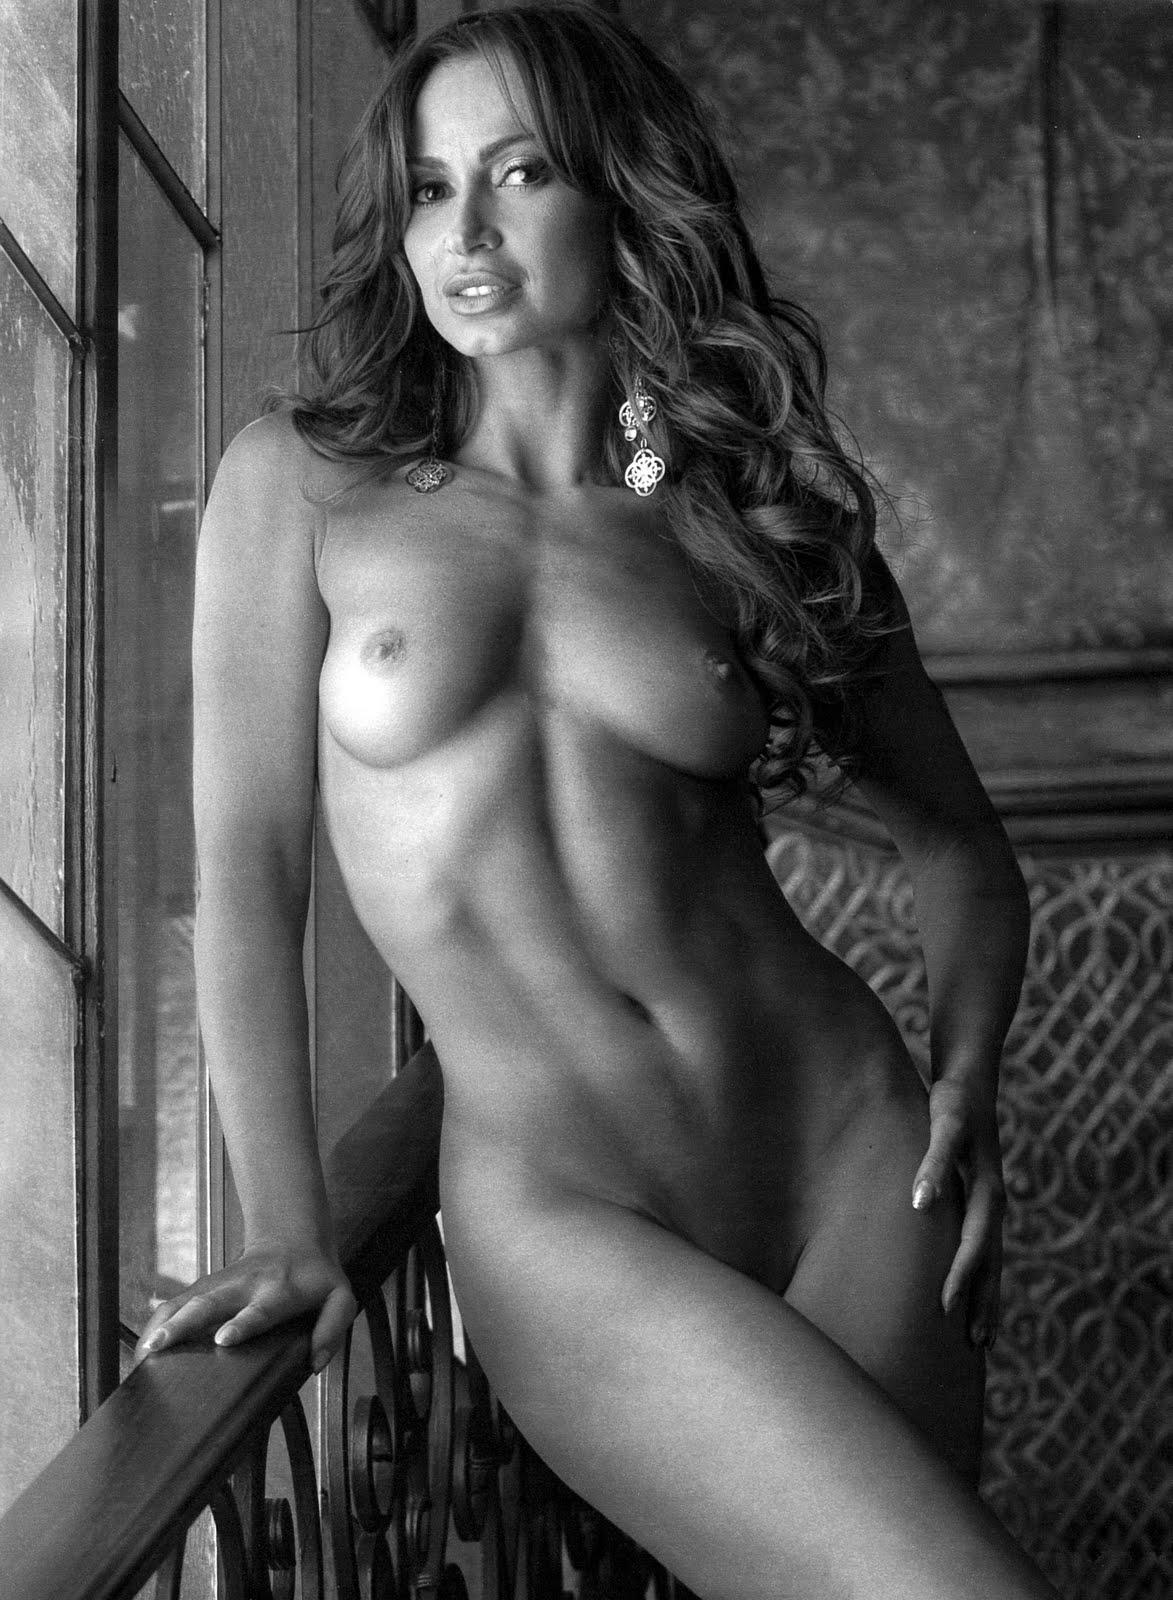 Karina Smirnoff Nude Playboy Photos  Gutteruncensoredcom-1548